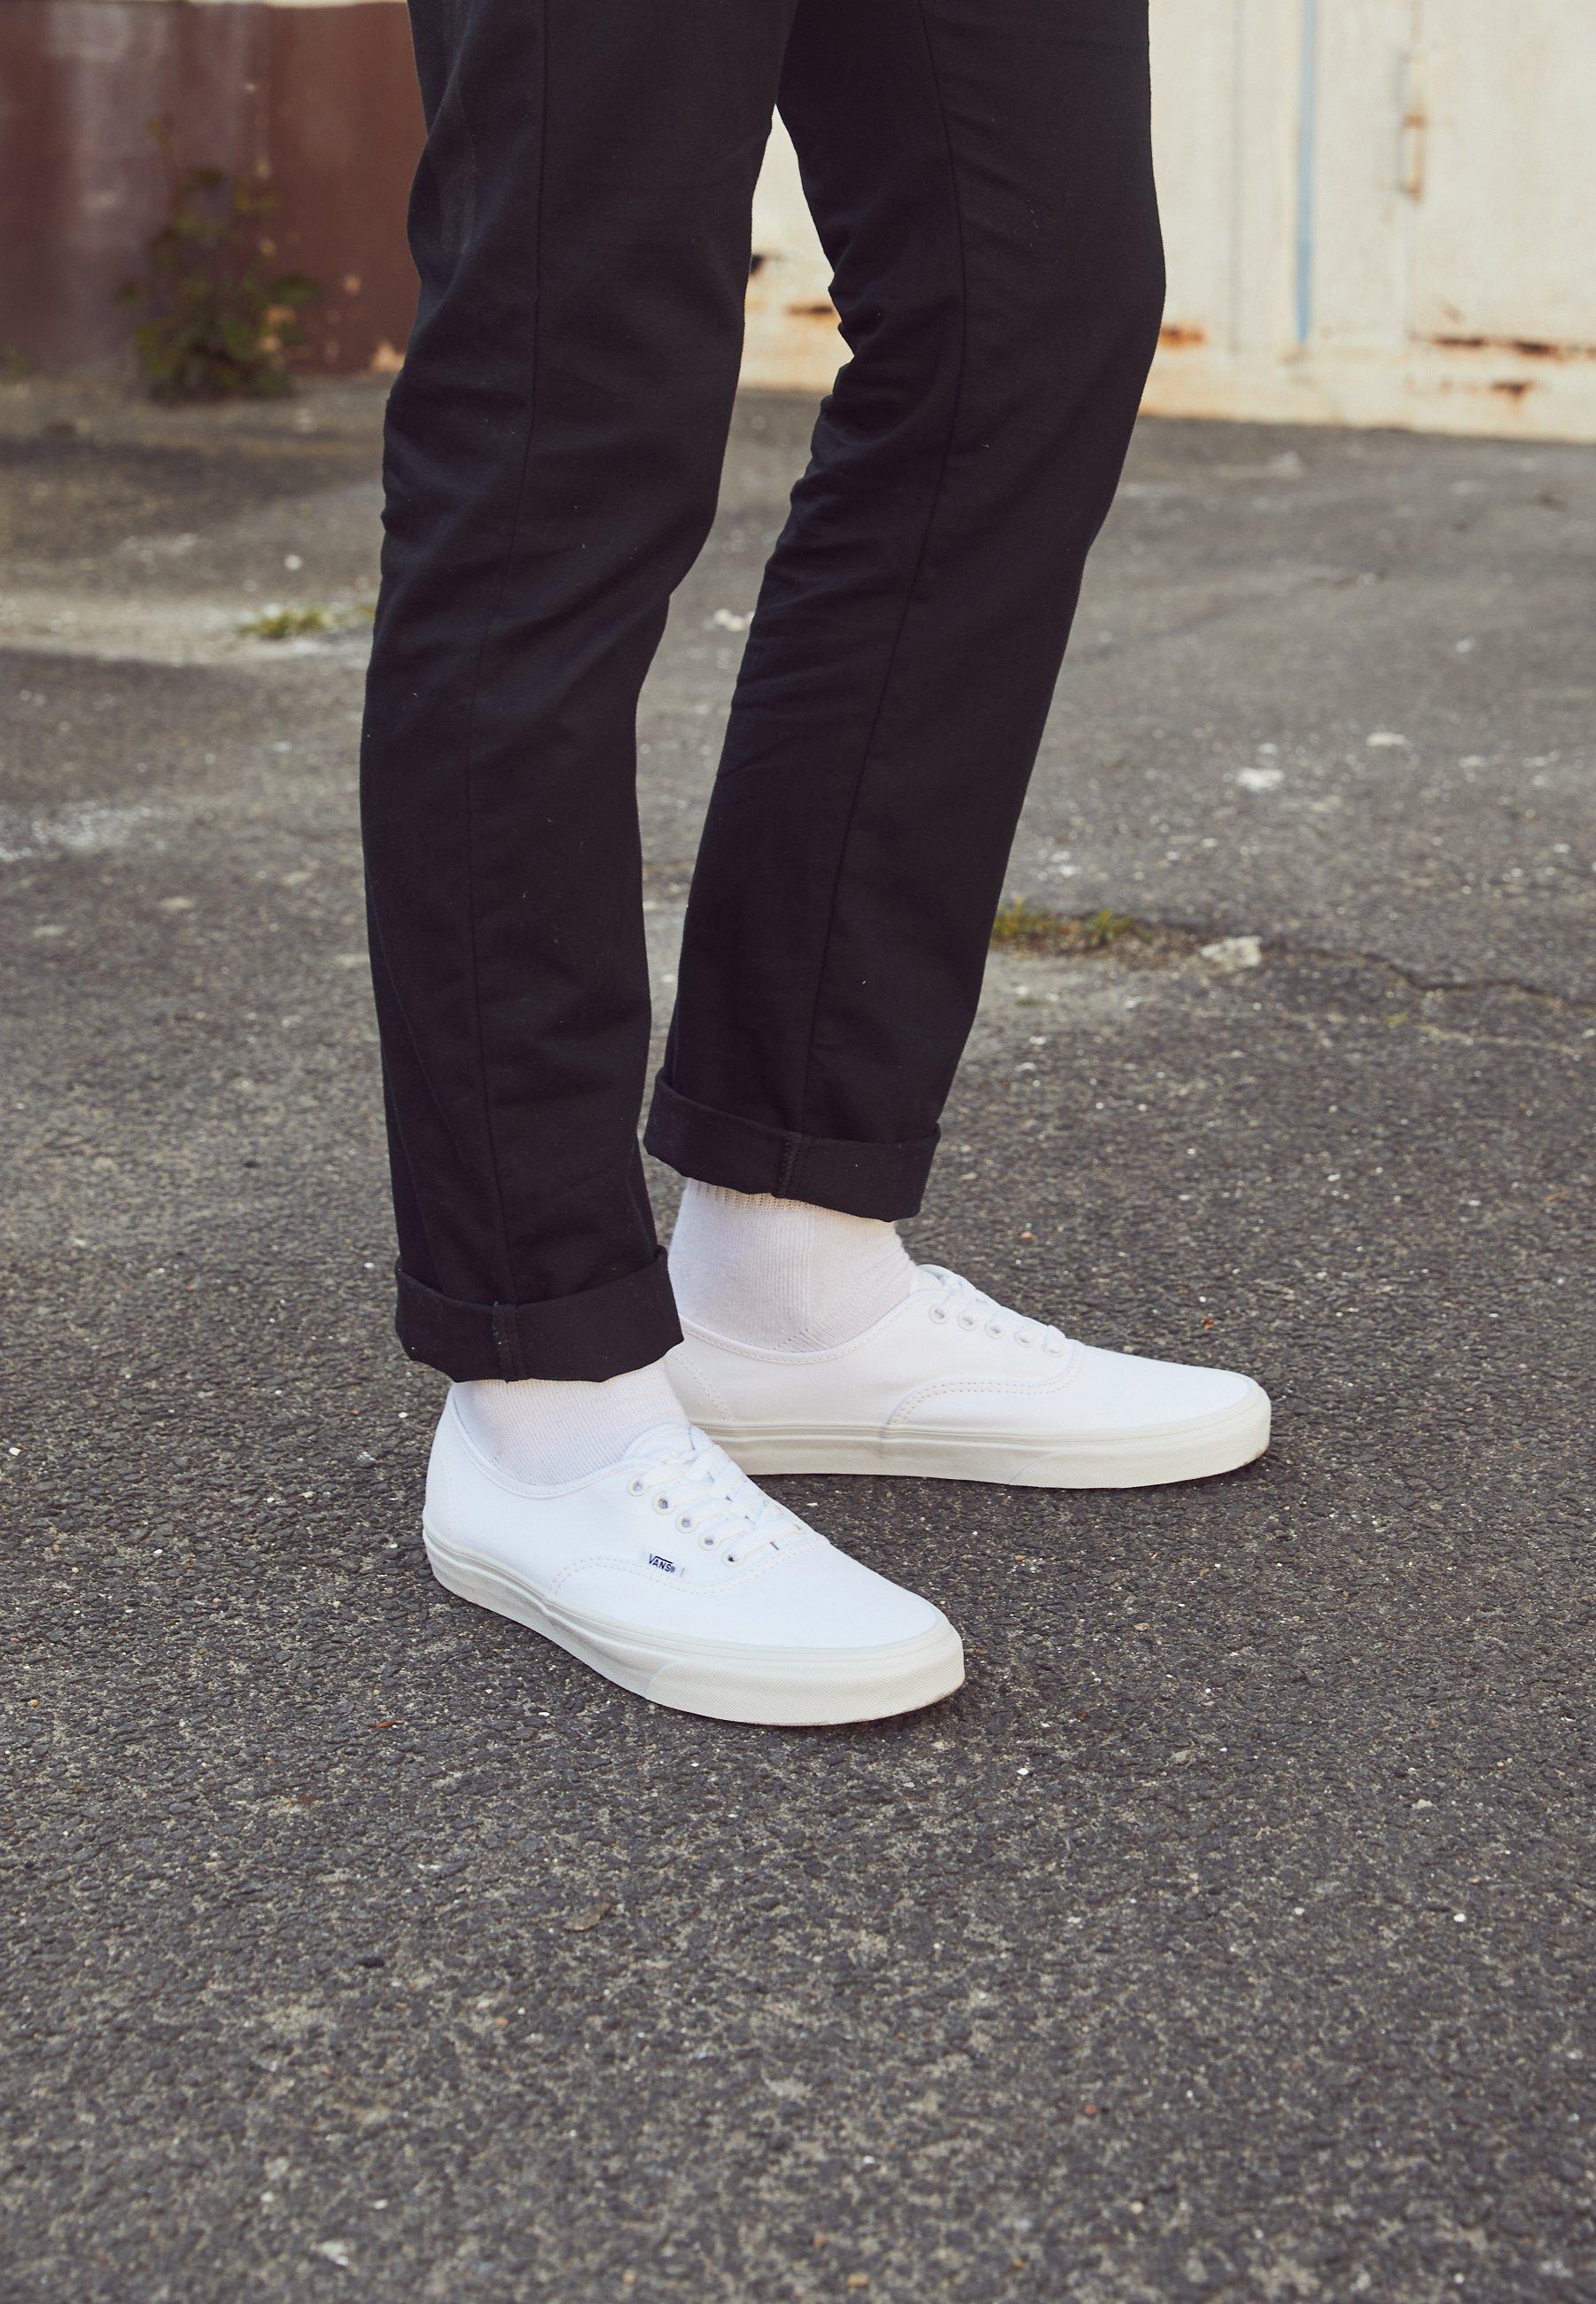 Vans AUTHENTIC - Baskets basses - true white/blanc - ZALANDO.FR